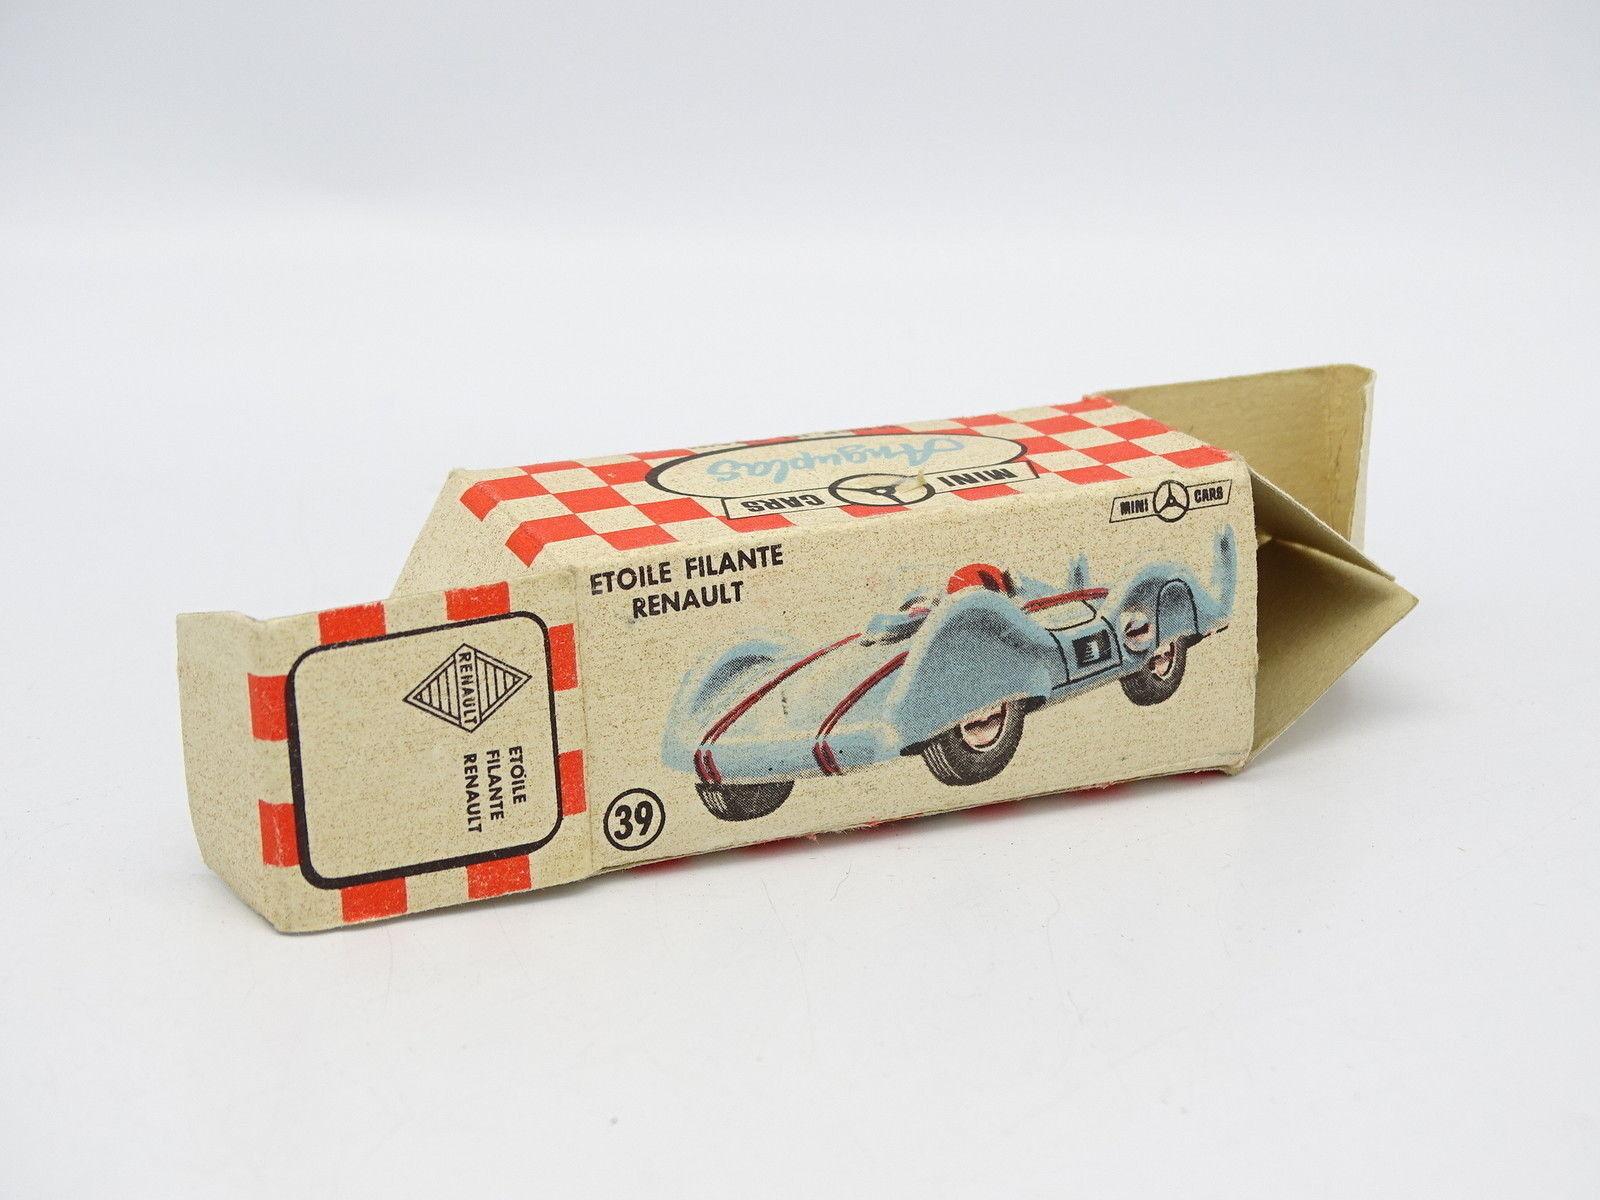 AnguPlas Mini Cars 1 86 - Schachtel leere Etoile Etoile Etoile Filante Renault 395325